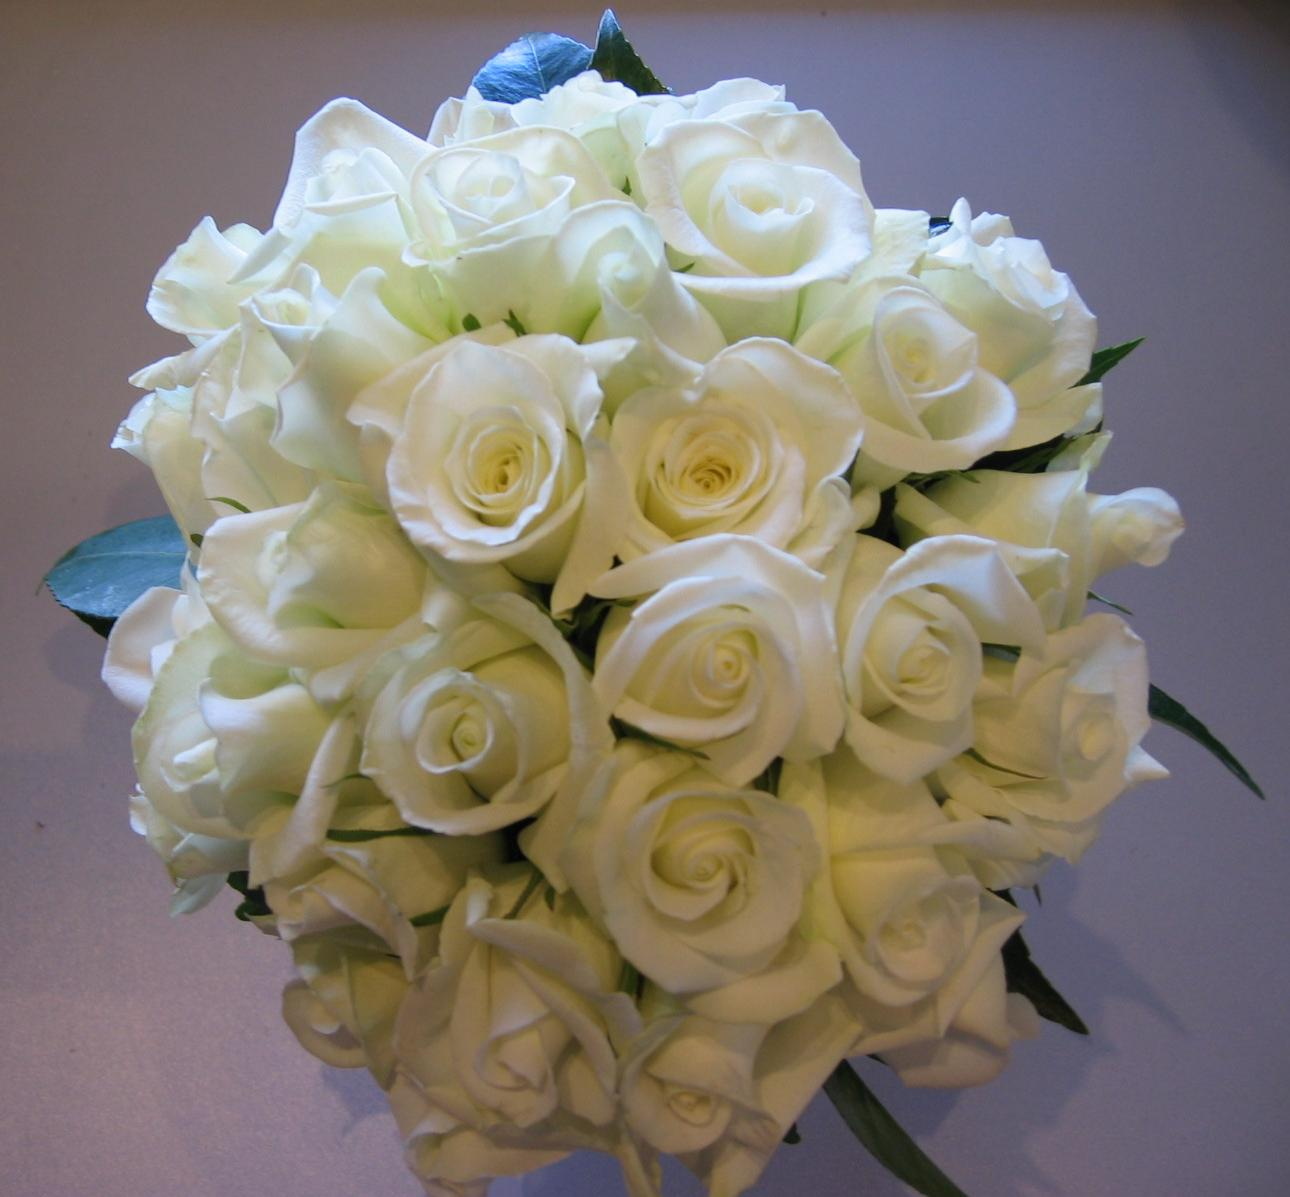 white rose flowers - photo #34